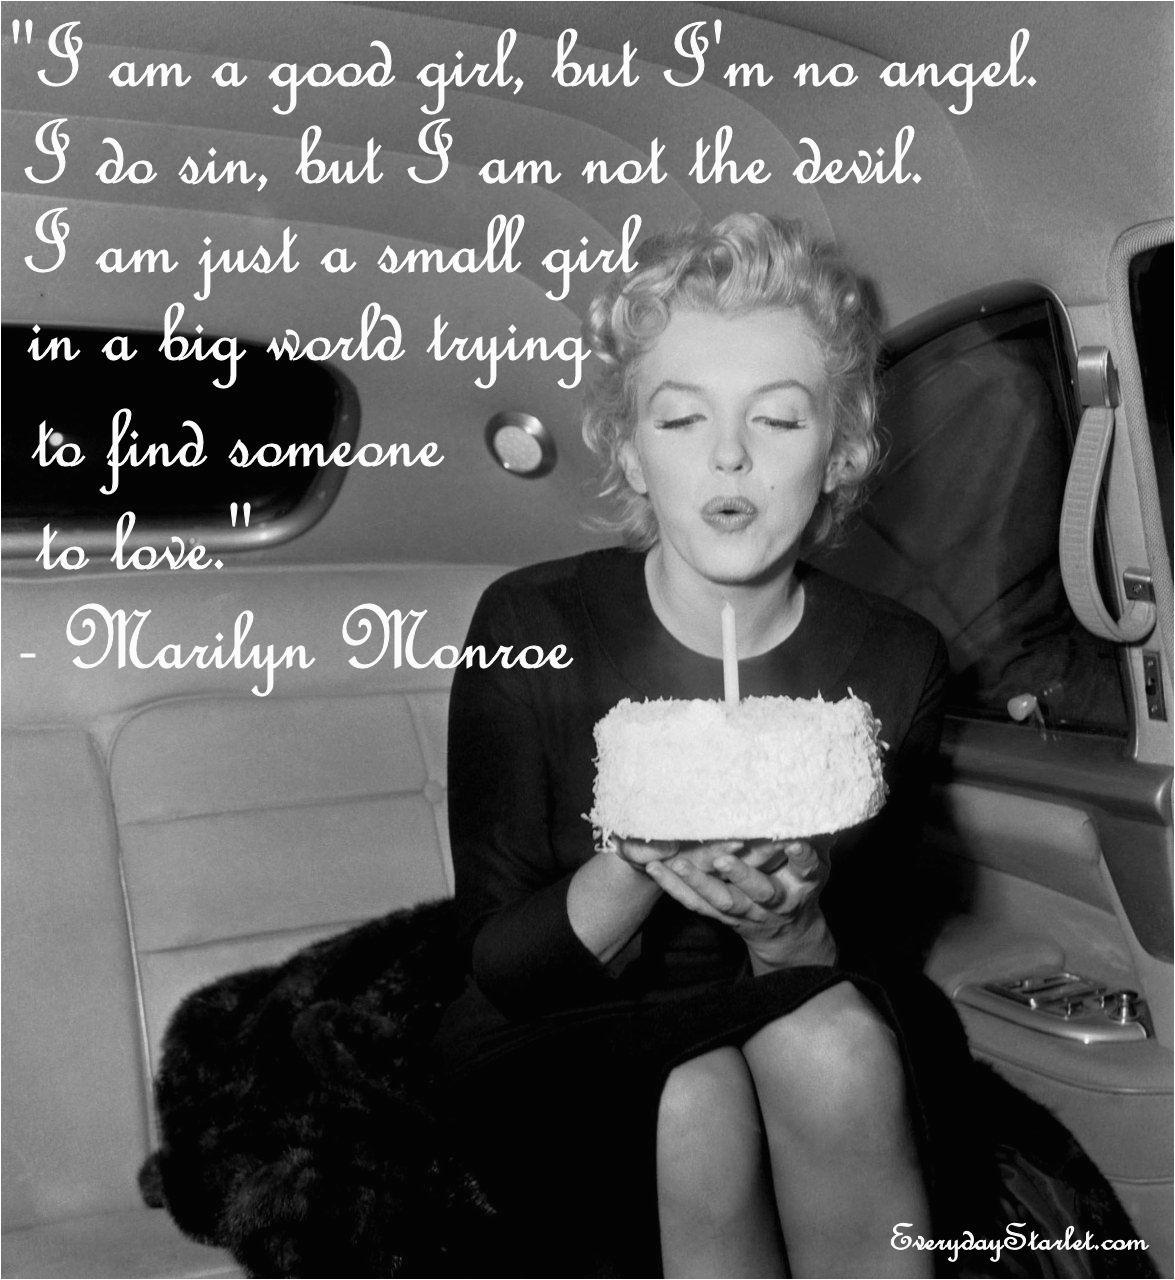 Marilyn Monroe Happy Birthday Quotes Marilyn Monroe Birthday Quotes Quotesgram